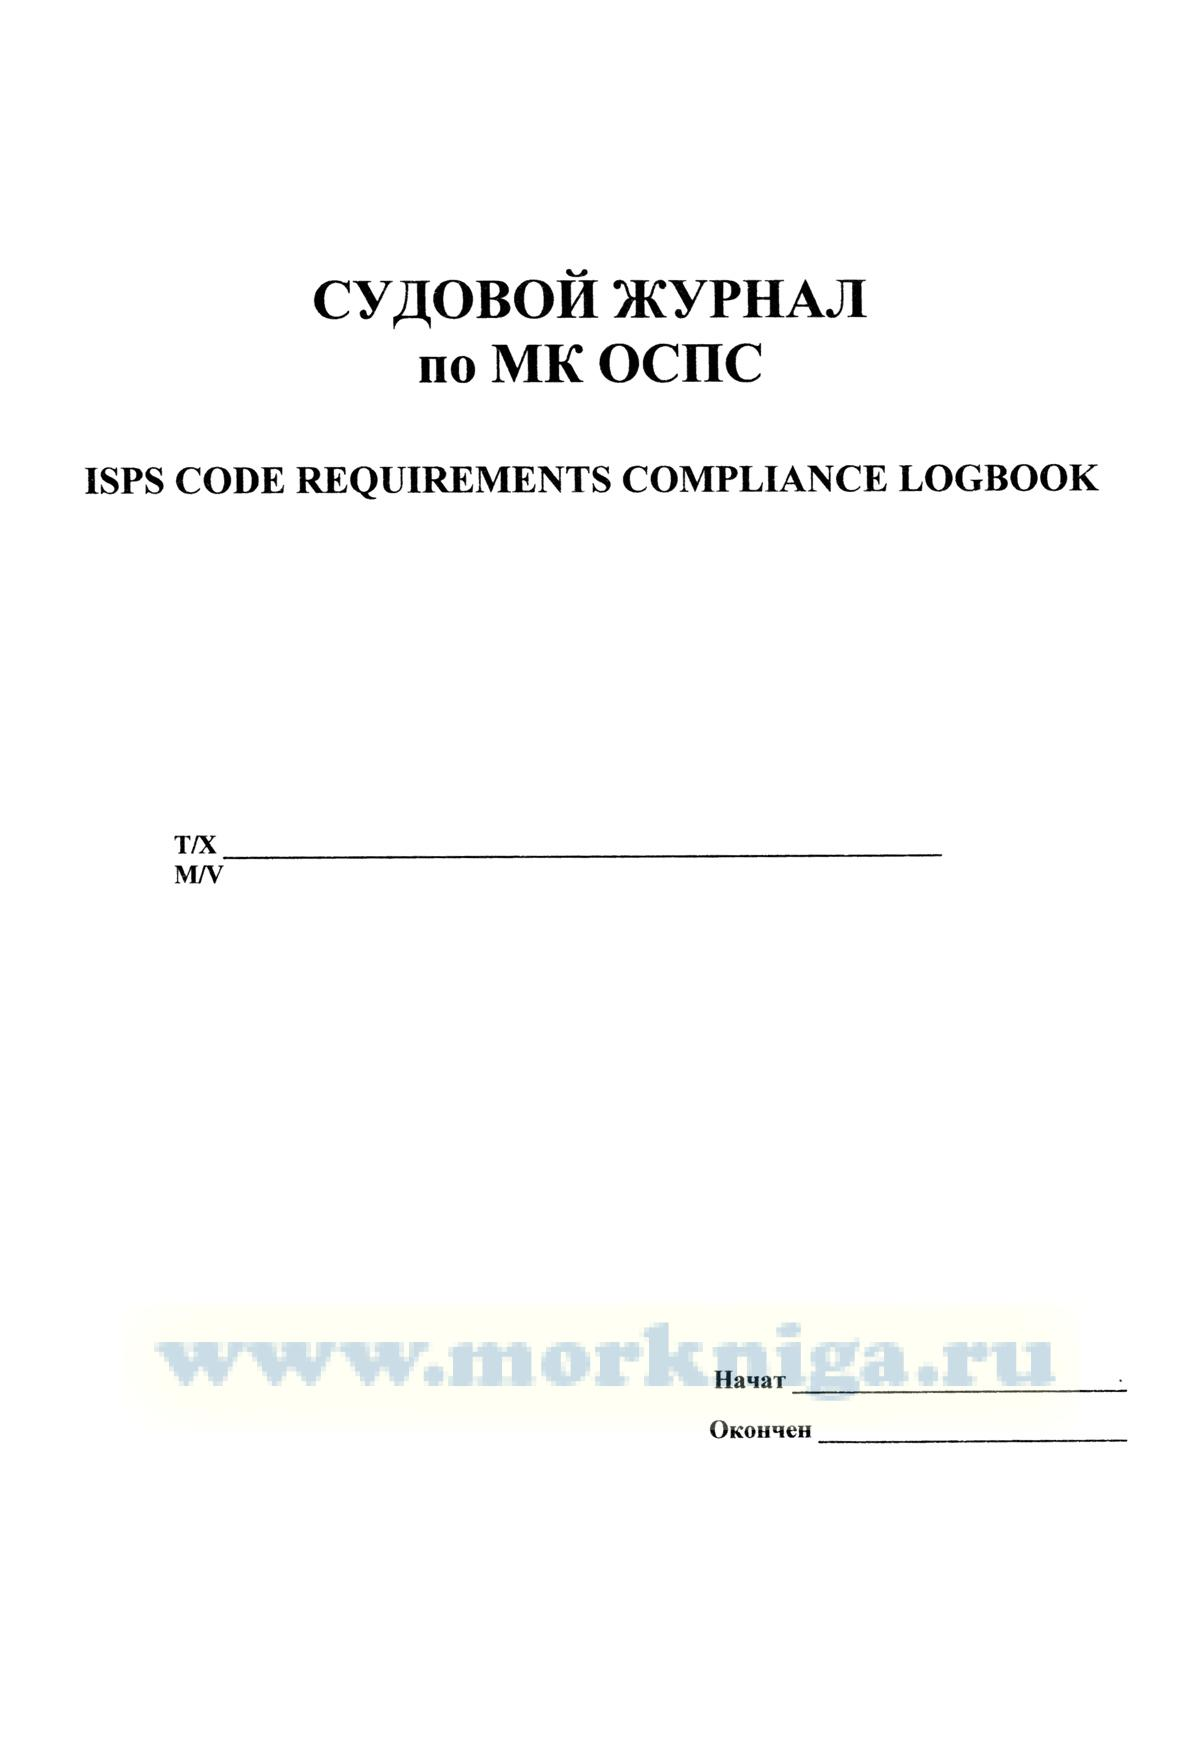 Судовой журнал по МК ОСПС. ISPS code requirements compliance logbook